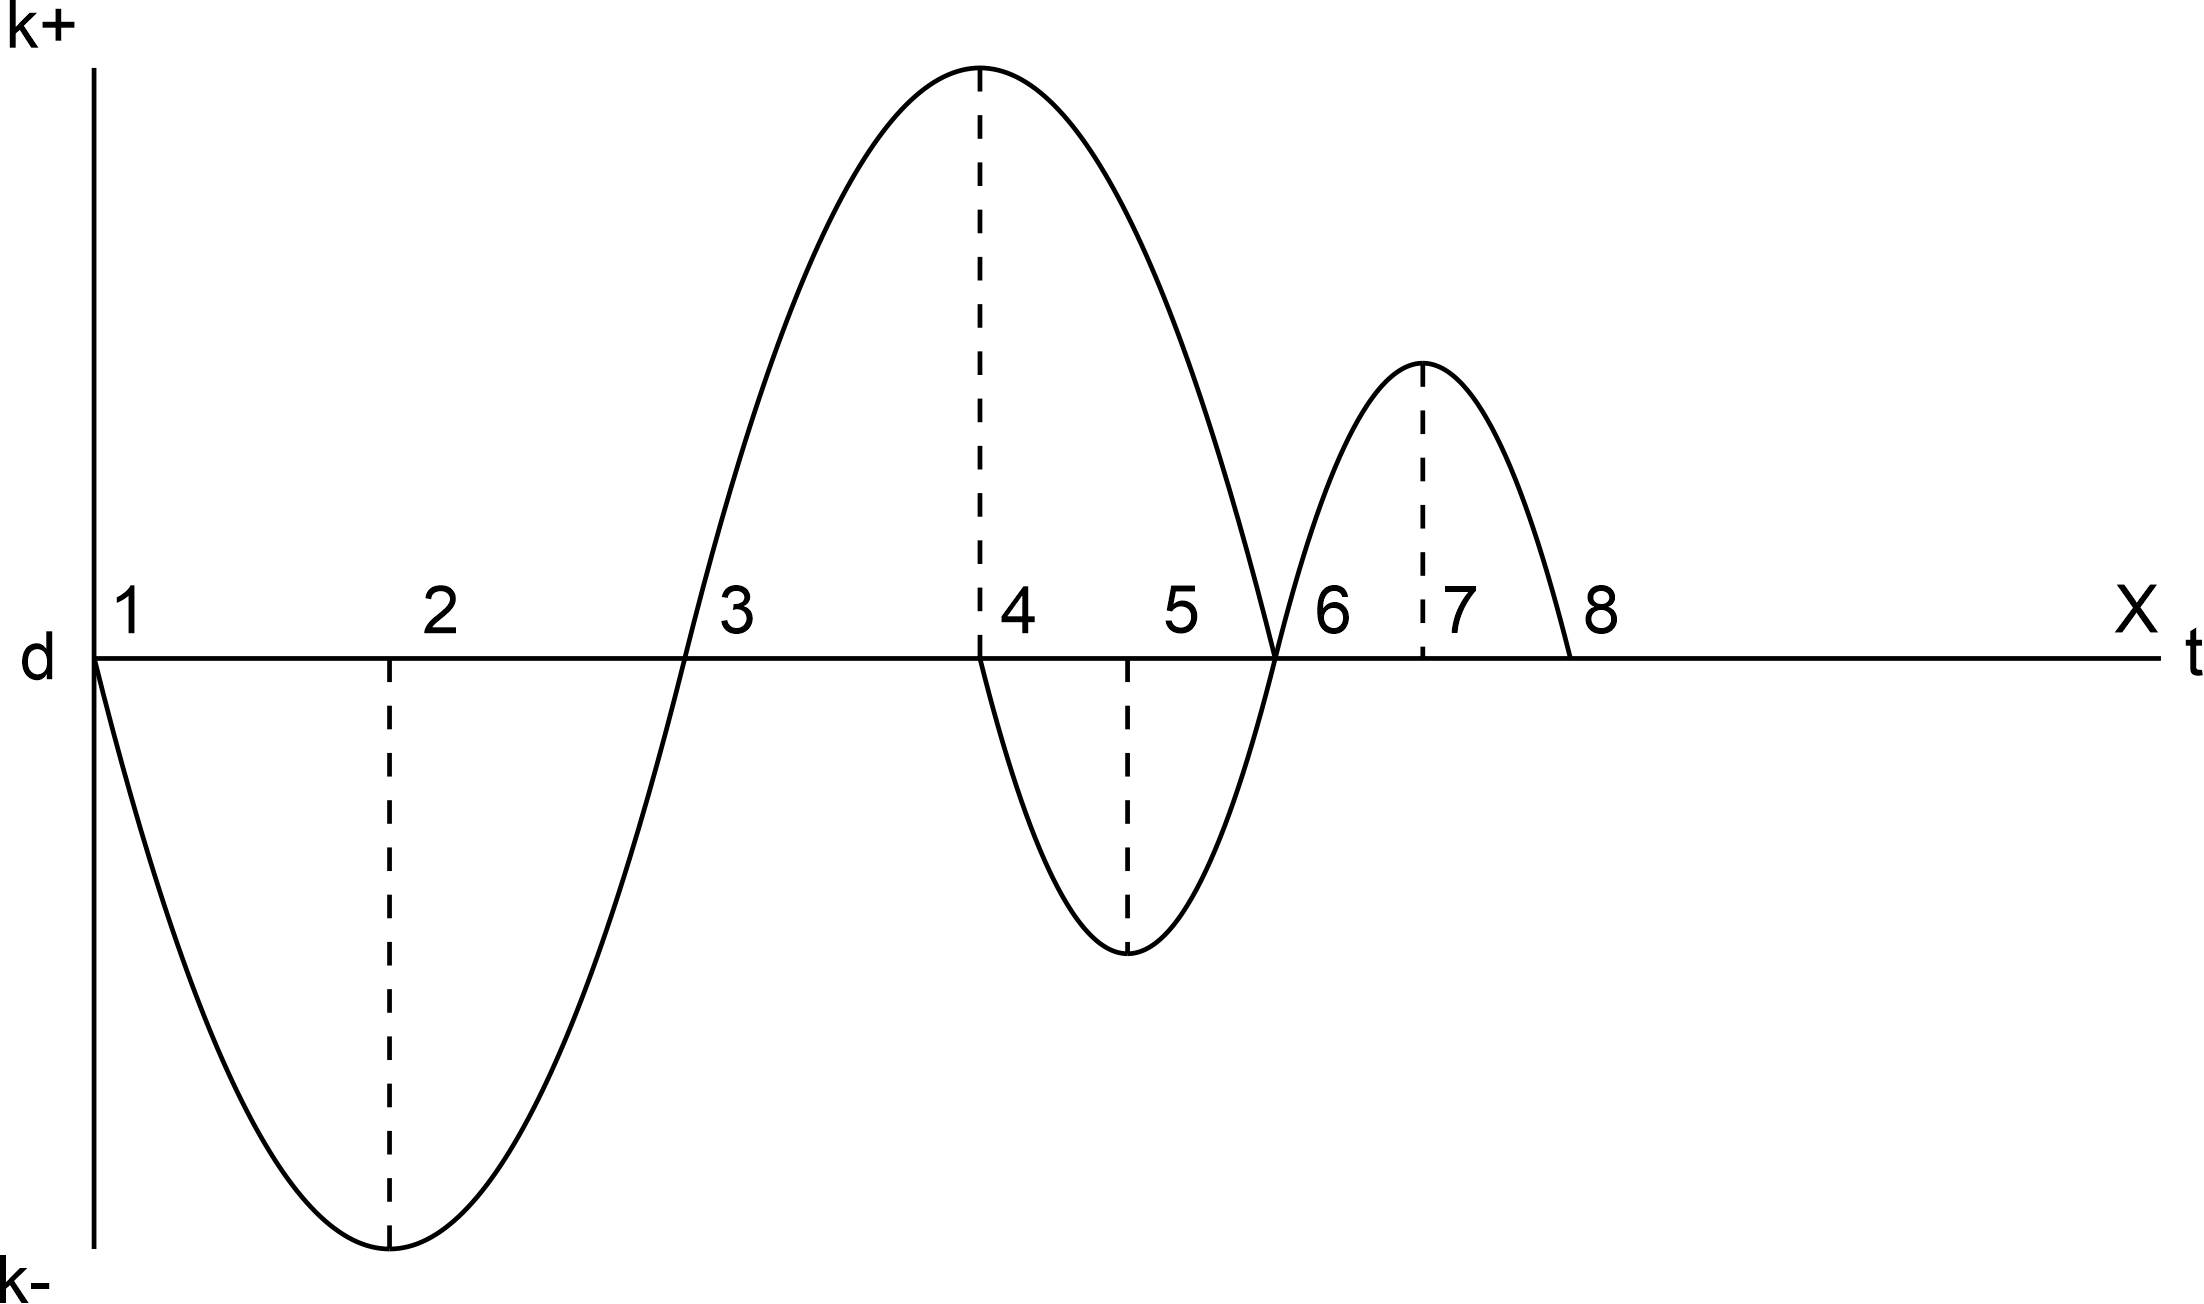 The Karmic Spiral 2